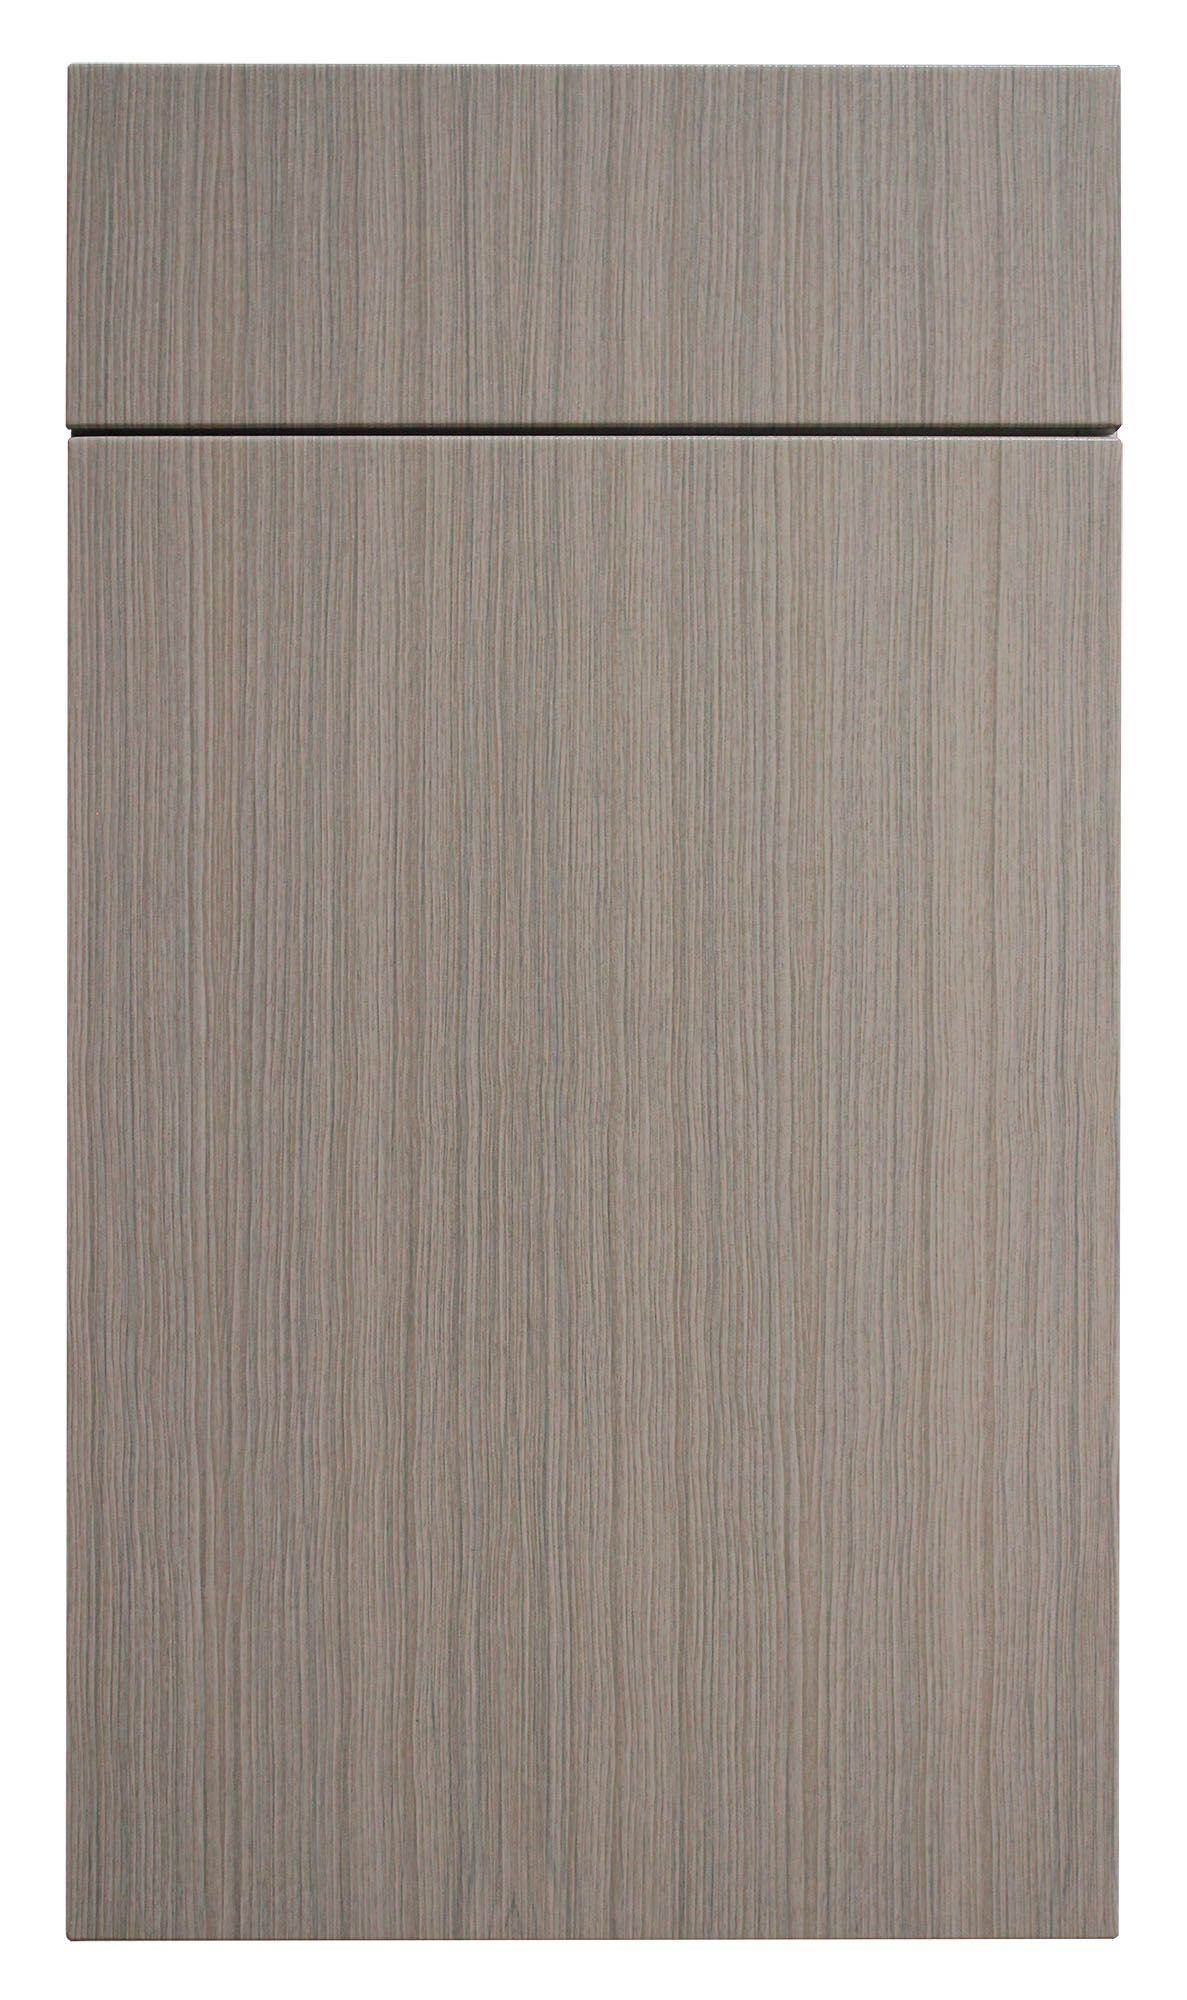 Aria 2d Sg1004 German Design Wholesale Cabinets Cabinets Online